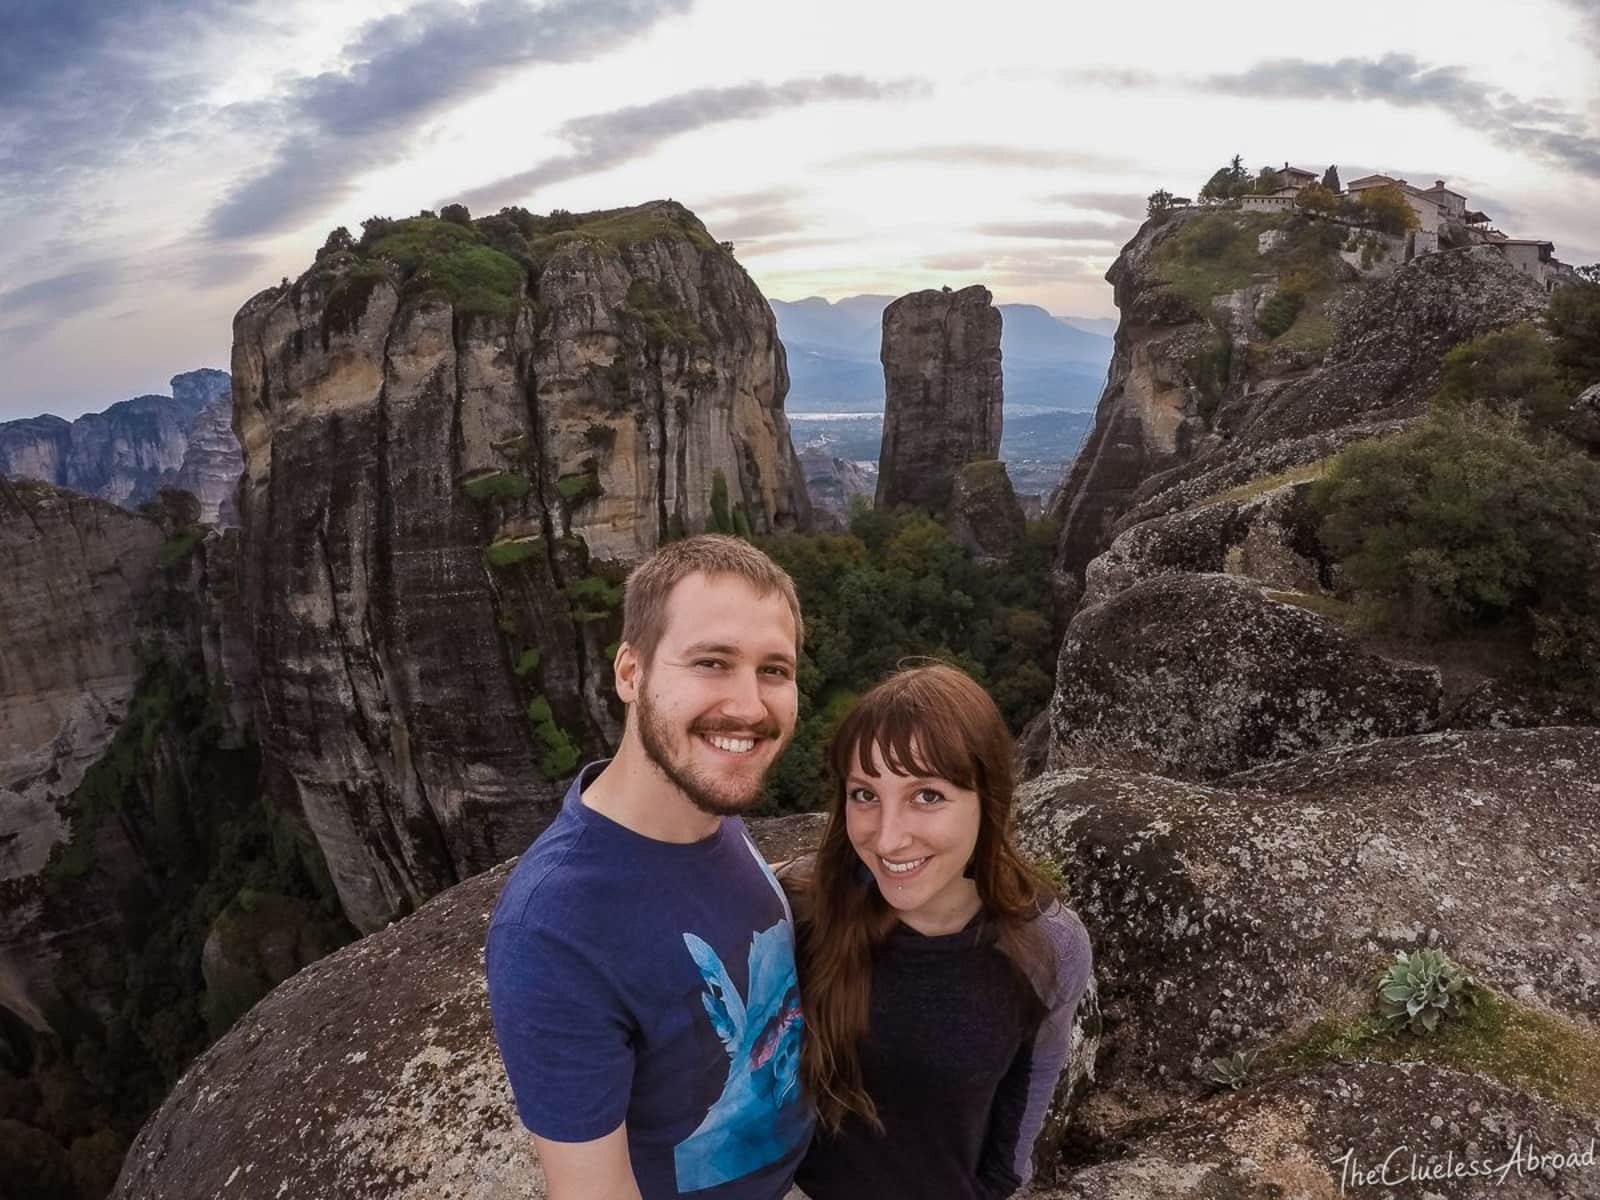 Kasia & Manuel from Switzerland